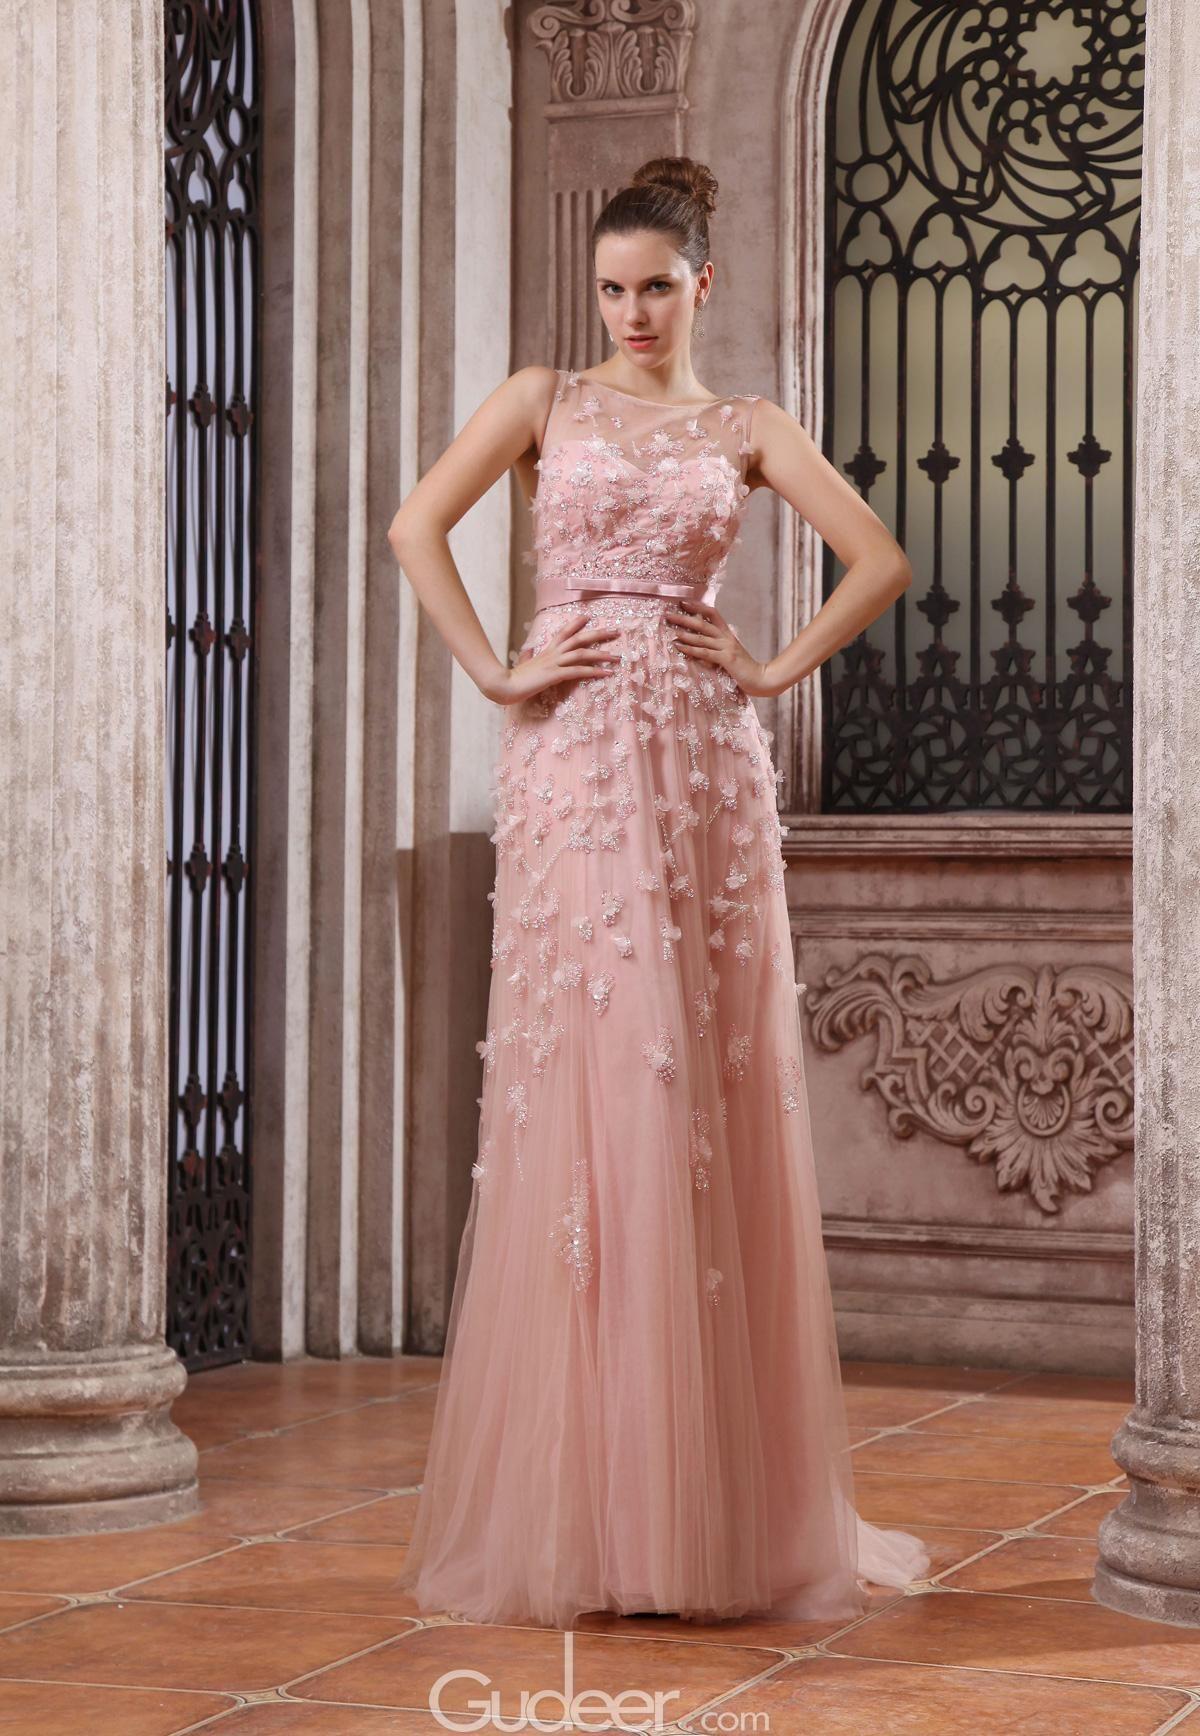 luxury peach tulle and chiffon sweetheart long evening prom dress. #weddingdresses #weddinggowns